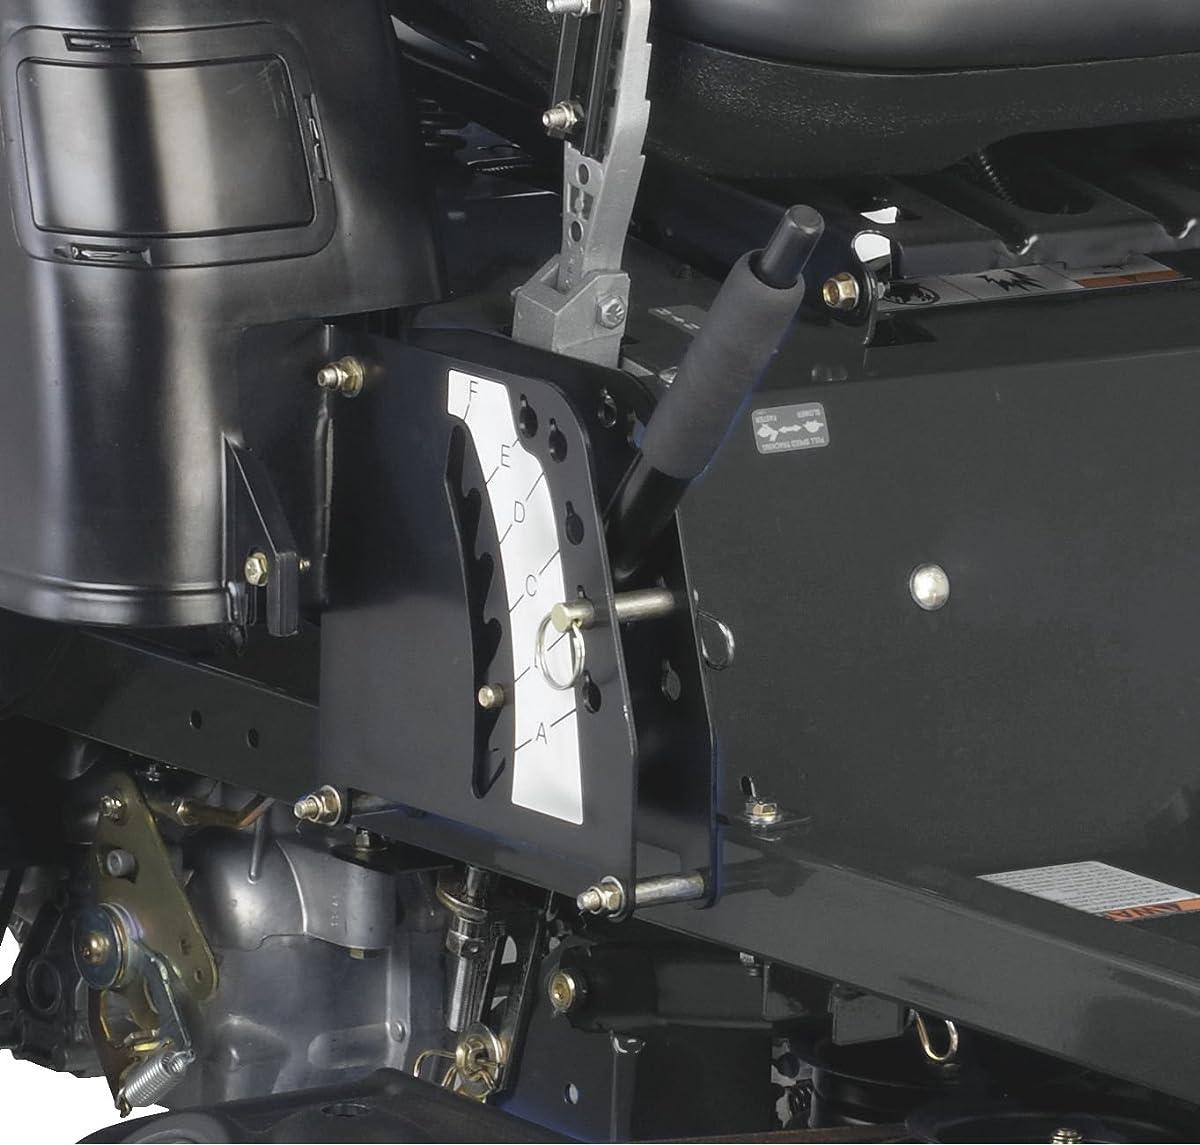 Poulan Pro P46ZX Briggs V-Twin Pro 22 HP Cutting Deck Zero Turn Radius Riding Mower, 46-Inch